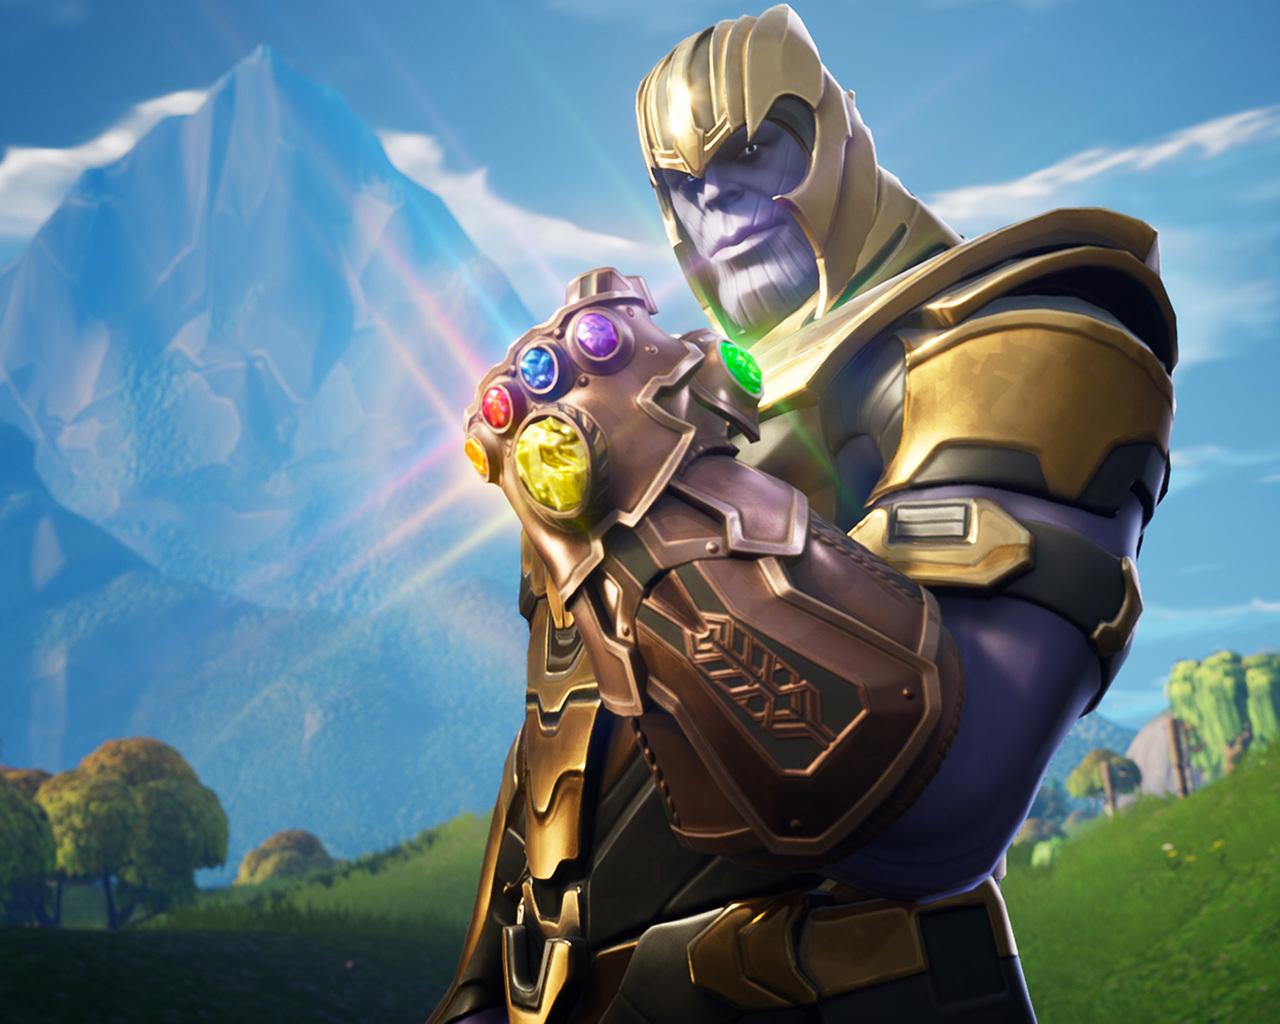 1280x1024 Thanos In Fortnite Battle Royale 1280x1024 Resolution HD 1280x1024